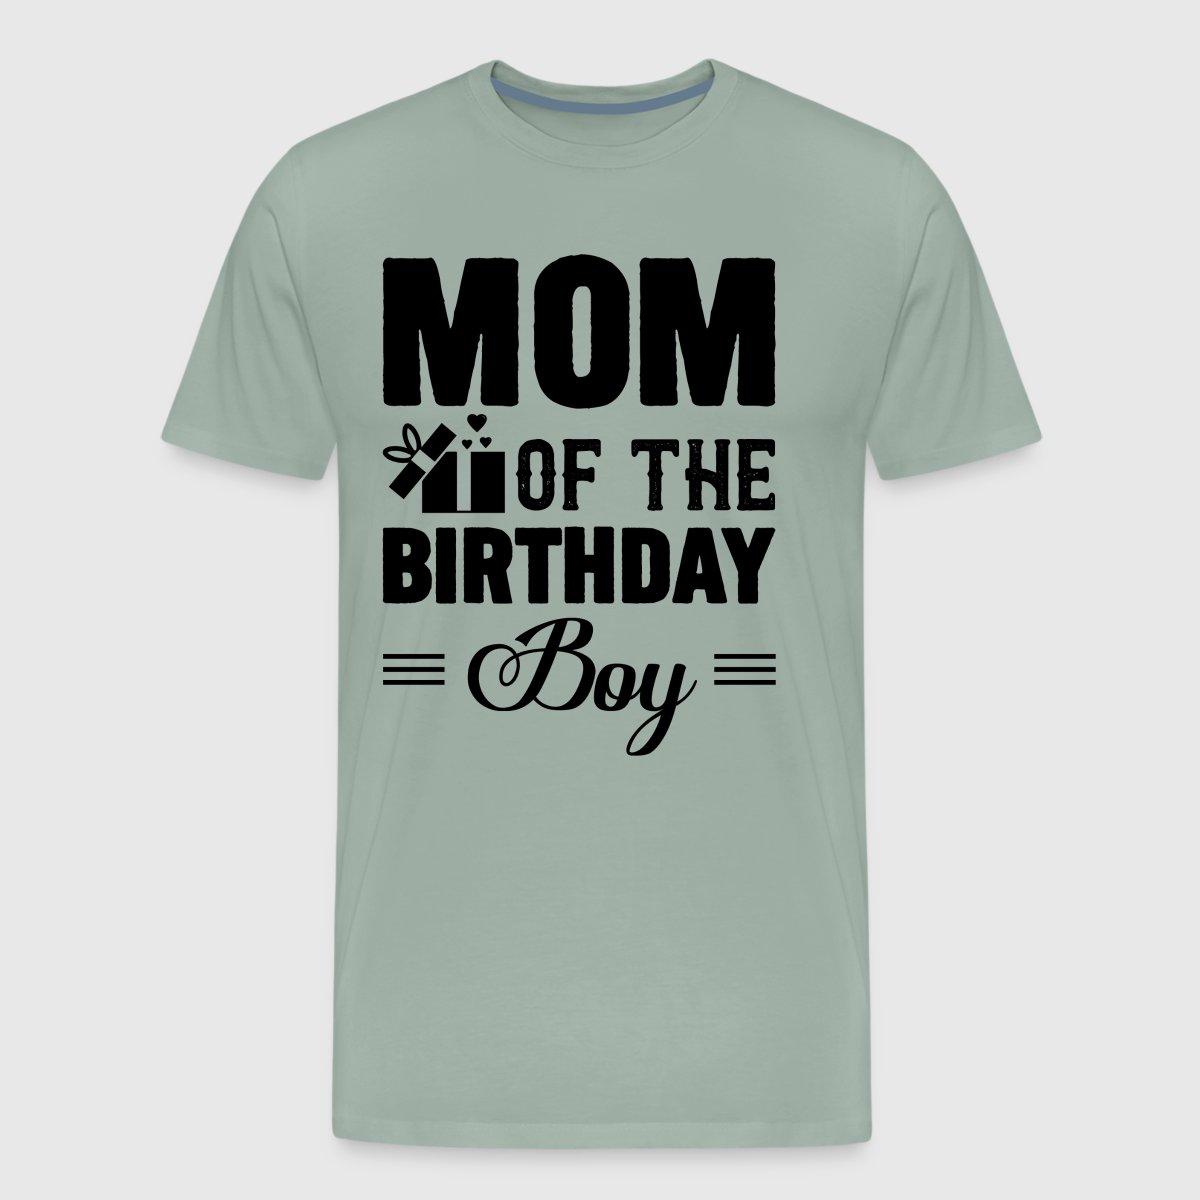 Birthday Boy Shirt For Mom